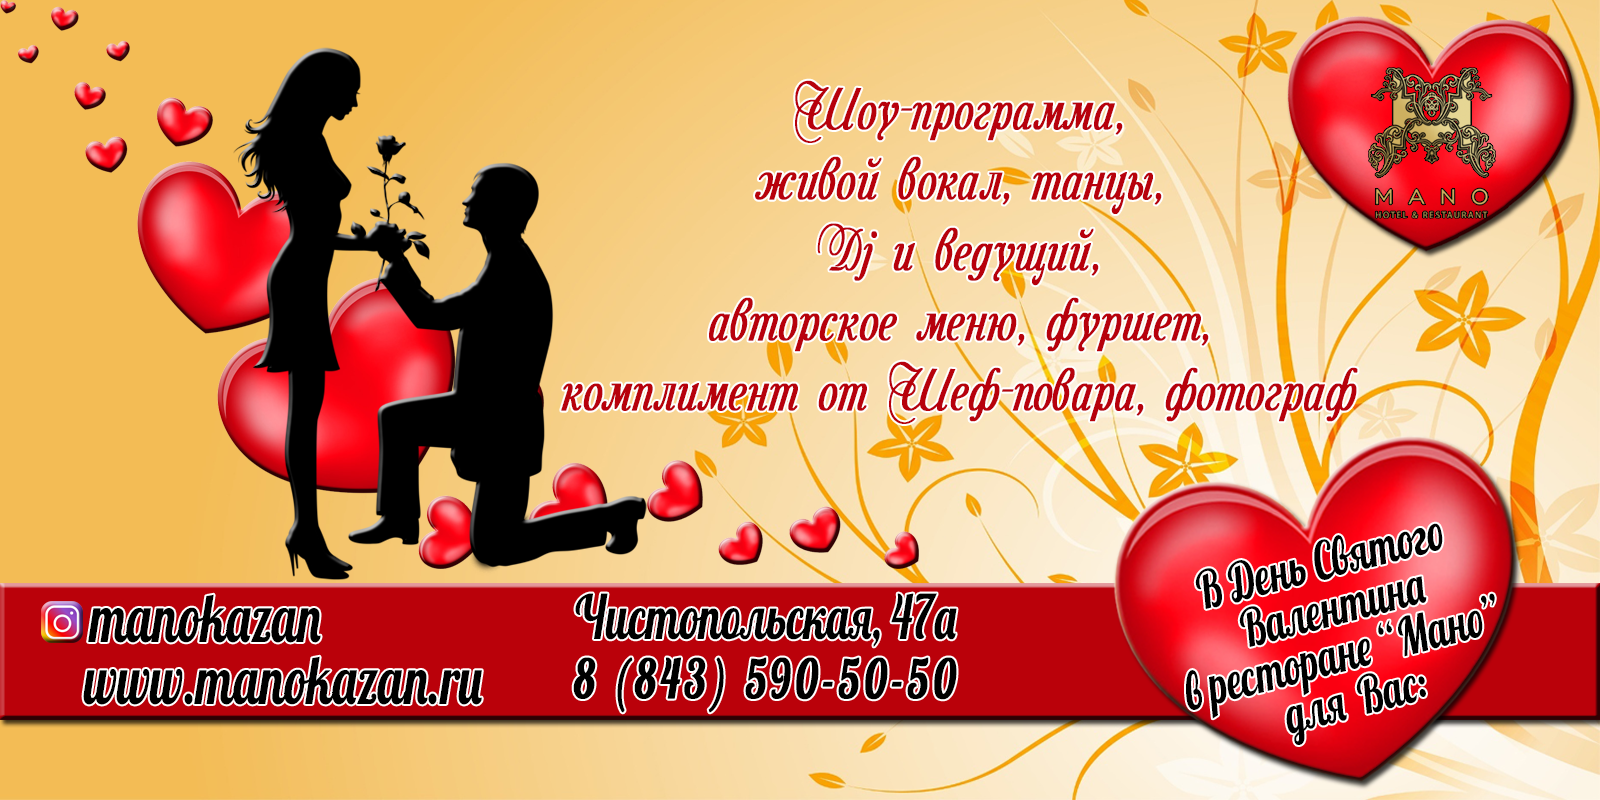 Mano_Пэкшот_Исправление_1800х600